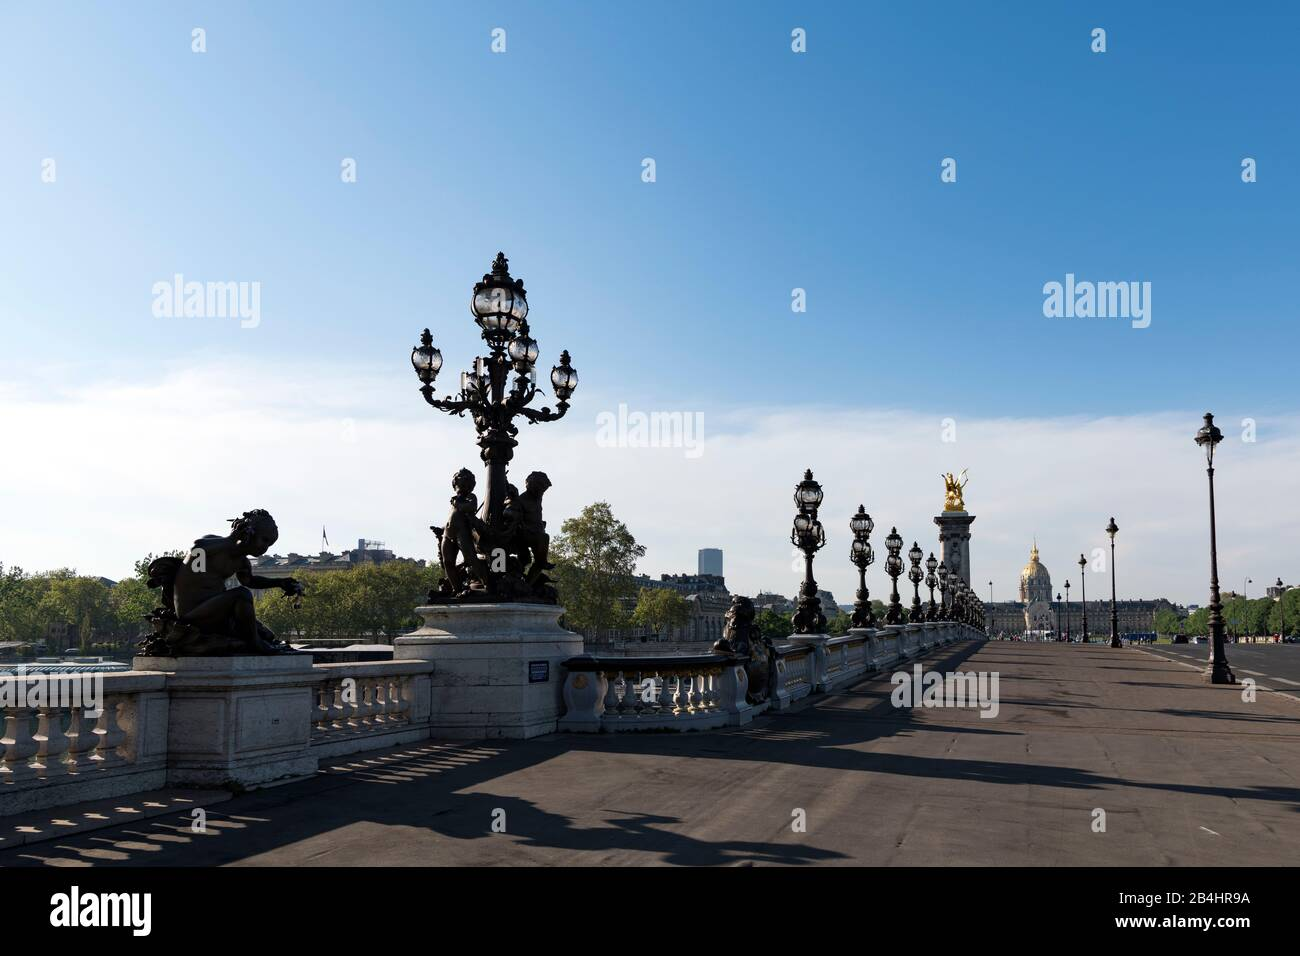 Verzierte Renaissance Straßenlatern auf der berühmten Brücke Pont Alexandre III, Paris, Frankreich, Europa Stock Photo